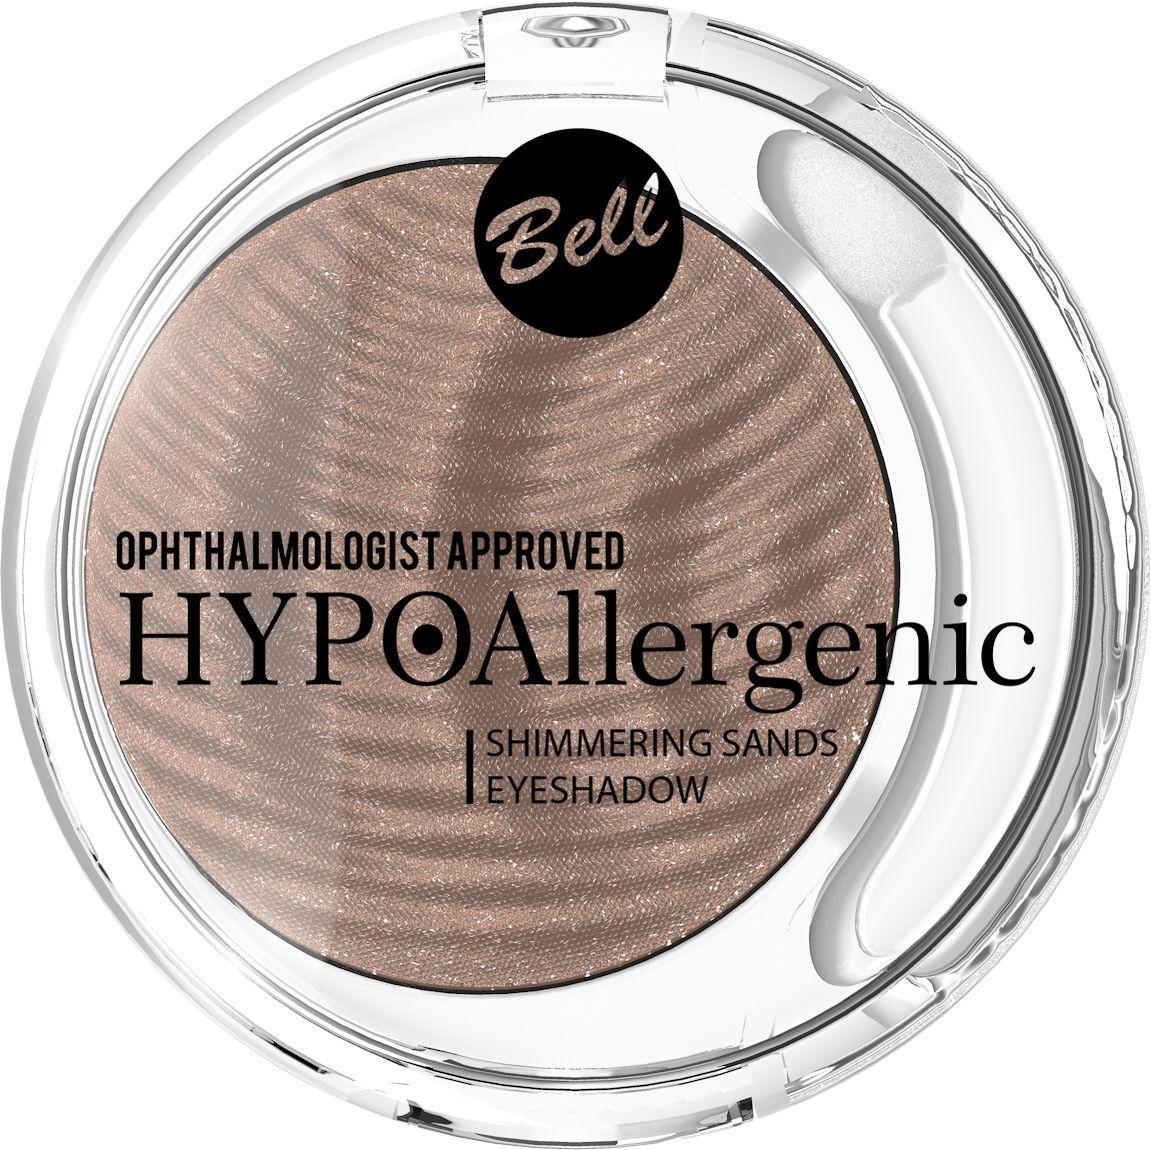 Bell Hypoallergenic Кремовые тени для век Shimmering Sands Eyeshadow, Тон №05